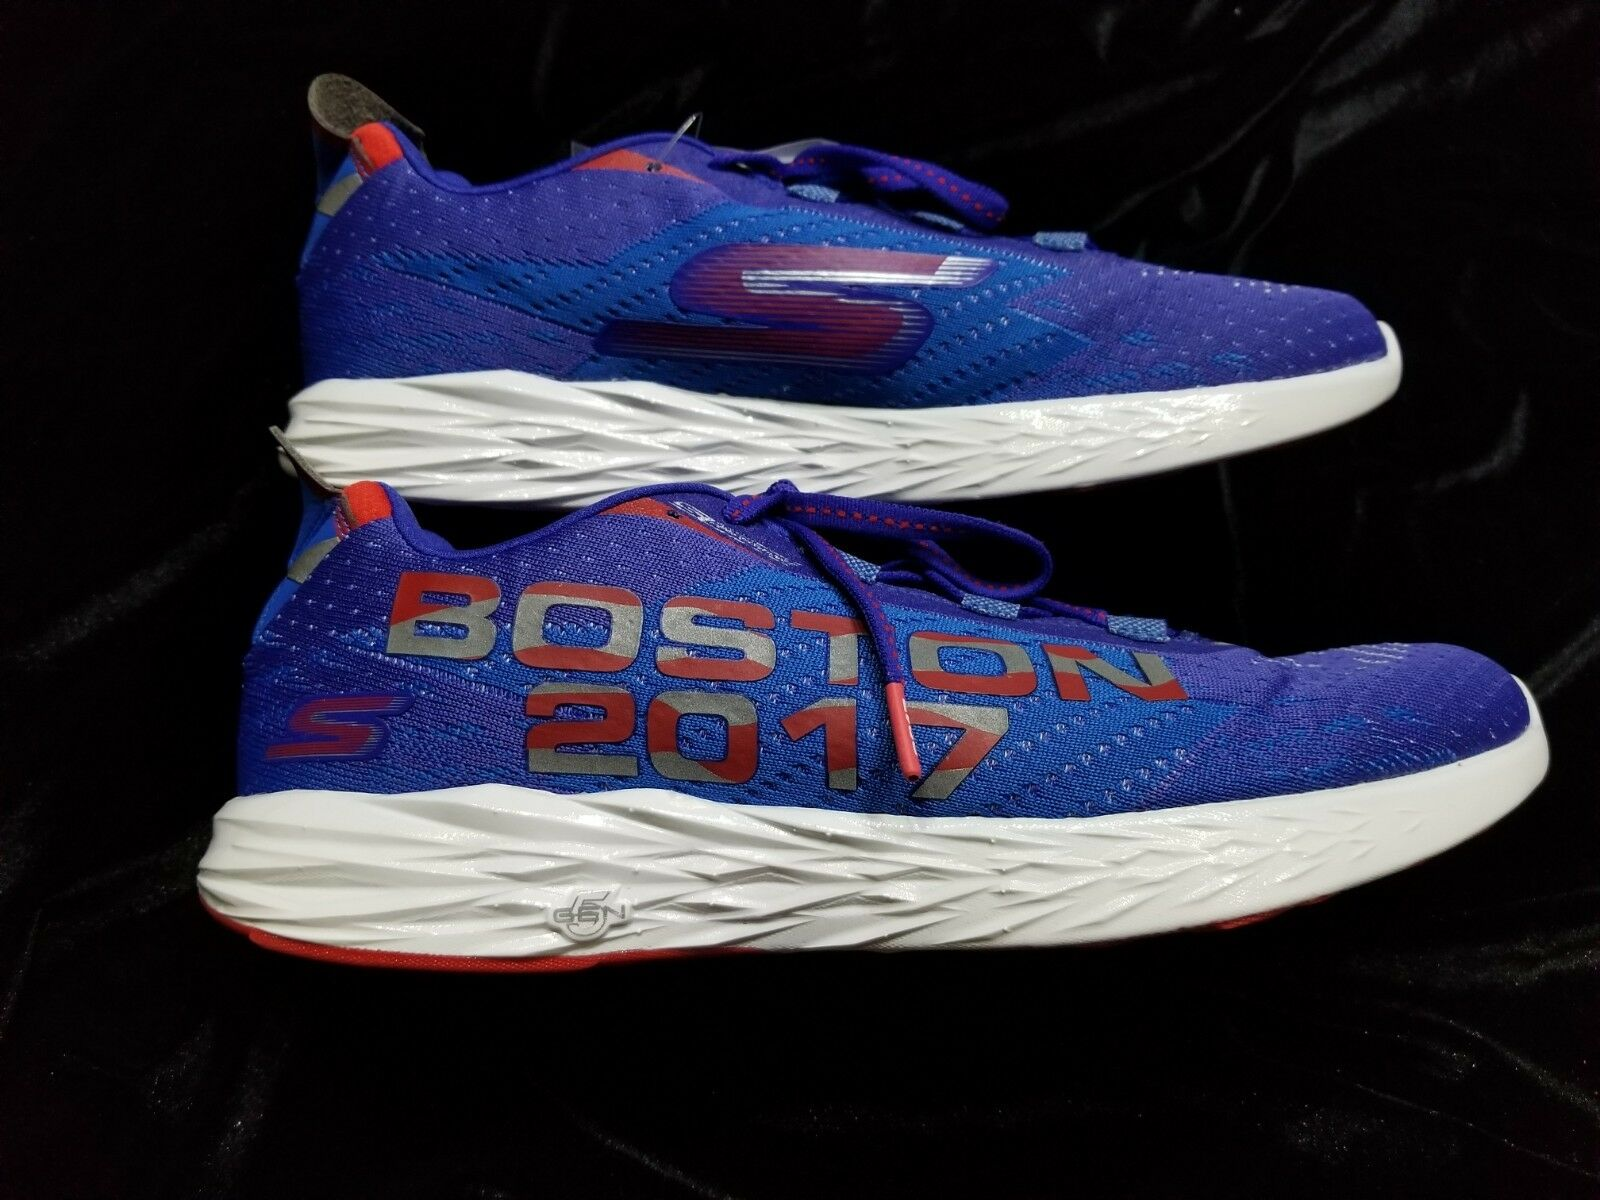 Brand New Skechers Go Run 5 Boston 2018 Blue Running Shoes - Mens Size 10